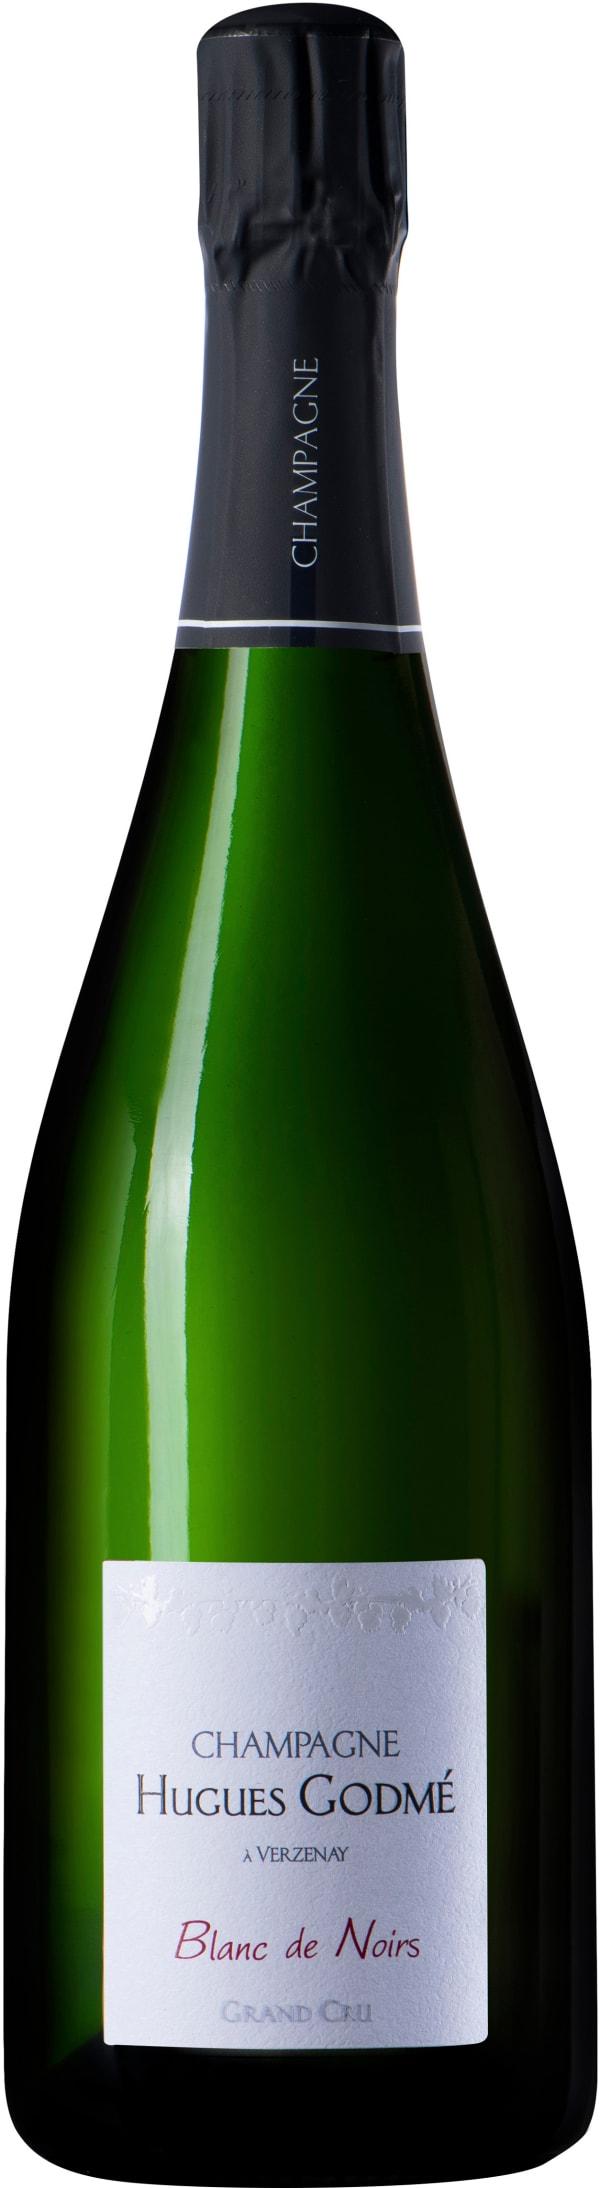 Hugues Godme Blanc de Noirs Grand Cru Champagne Extra Brut